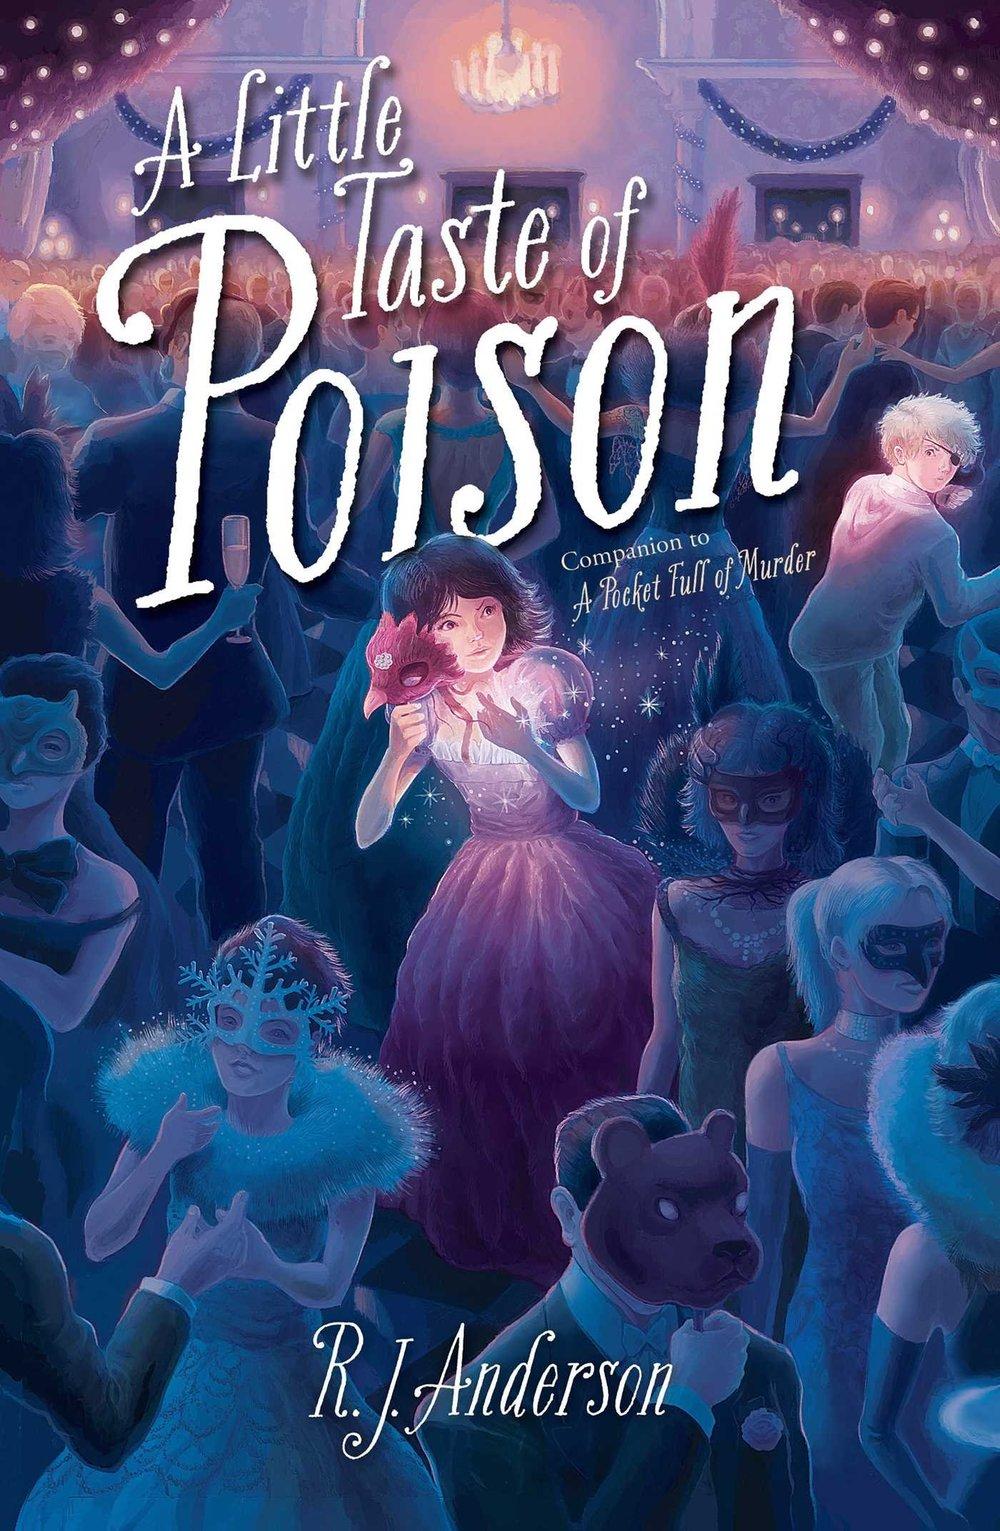 anderson-a little taste of poison.jpg